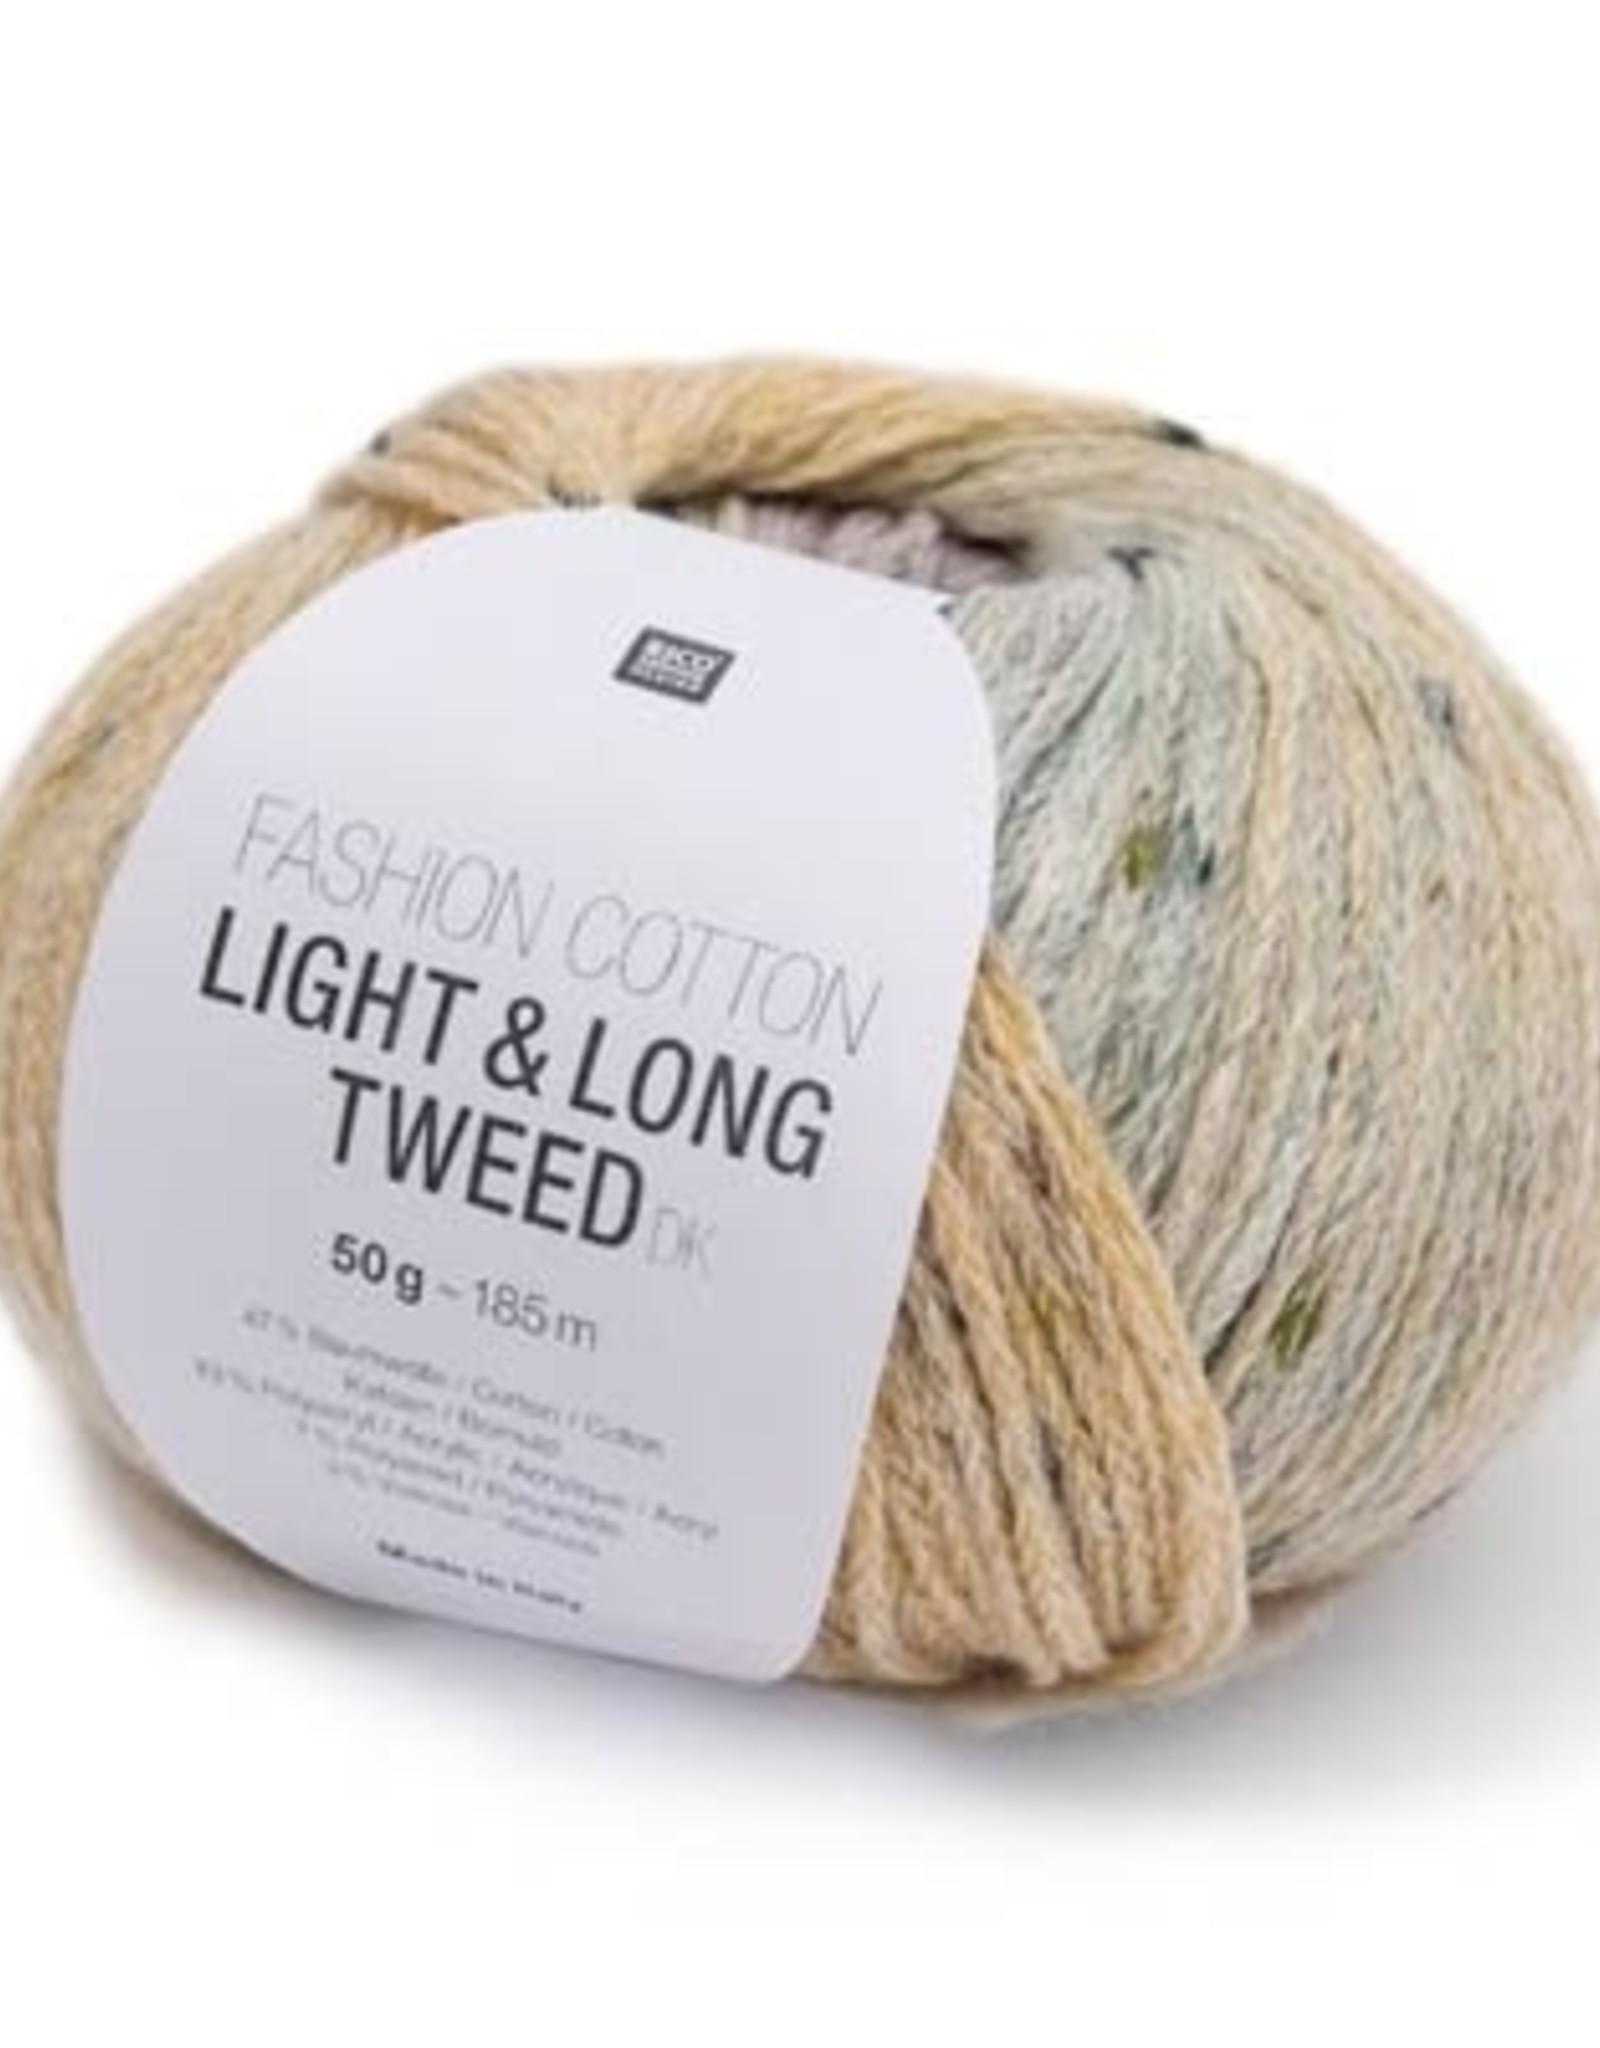 Fashion Cotton Light & Long Tweed